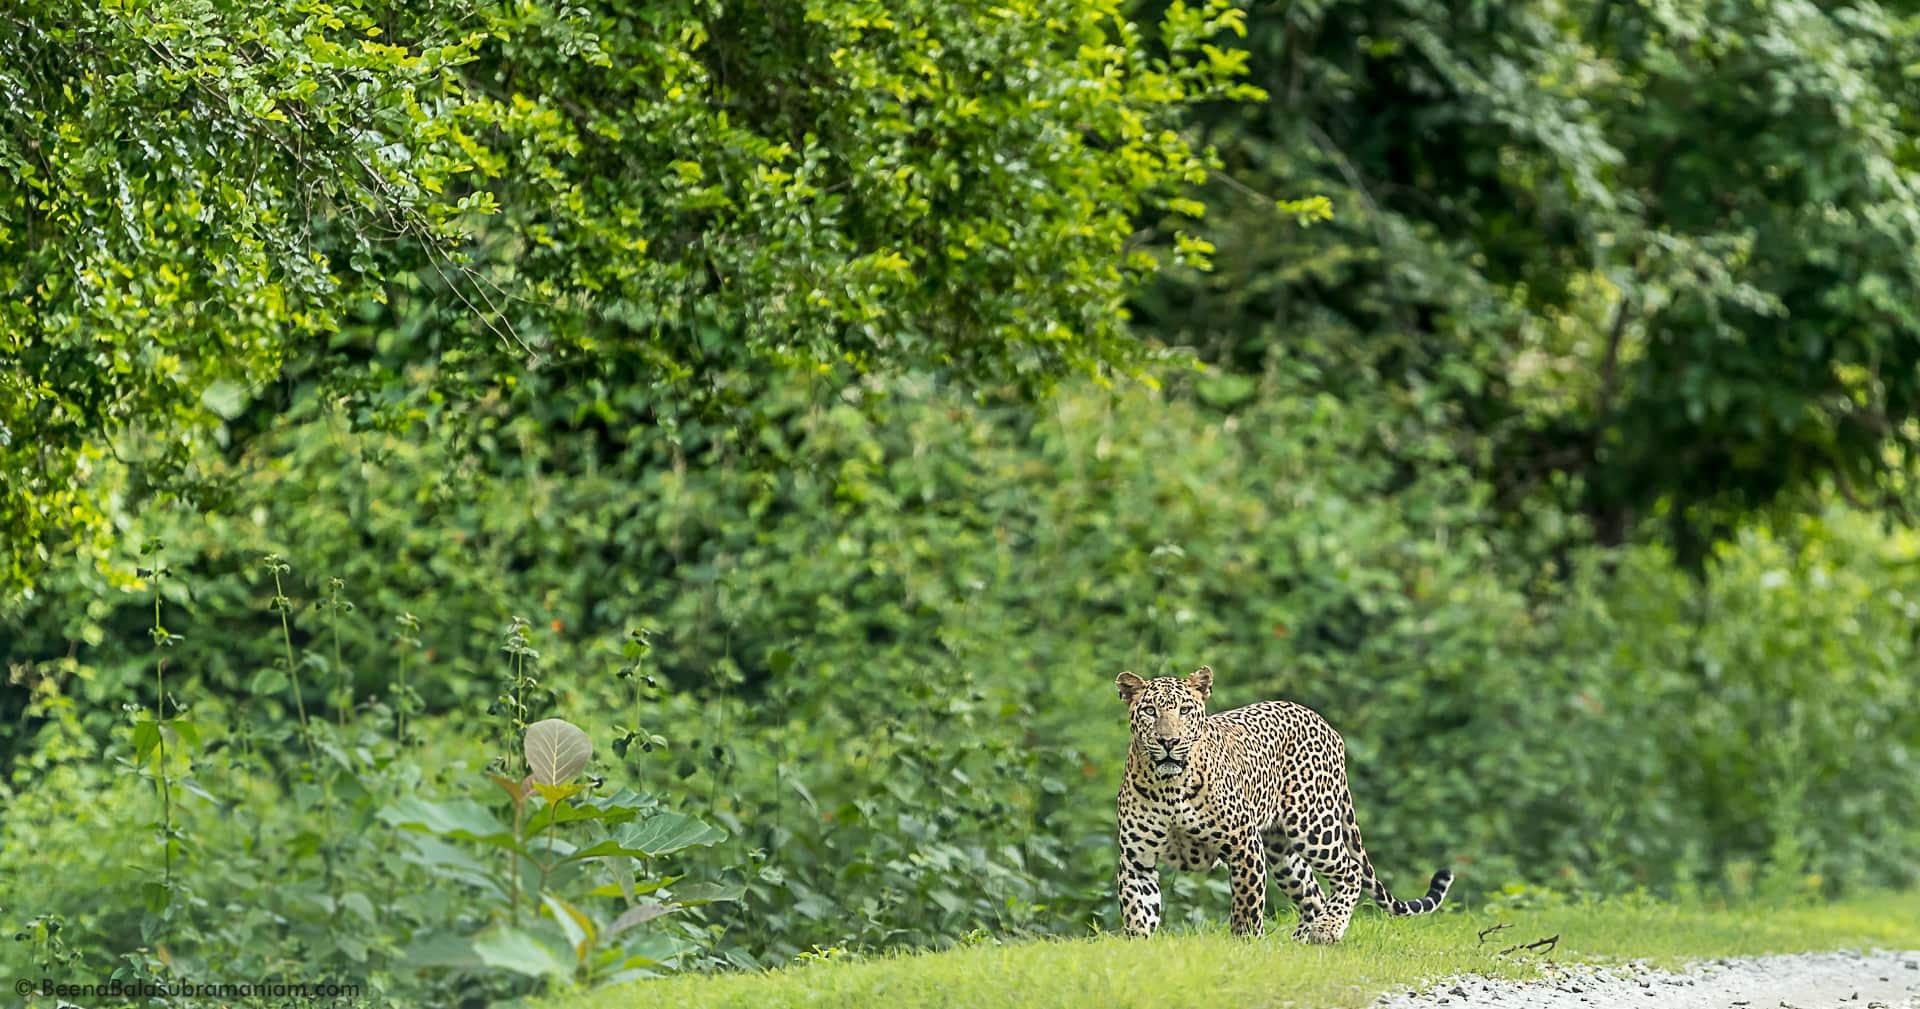 Panthera Pardus Fusca - The Indian Leopard photographed at Kabini